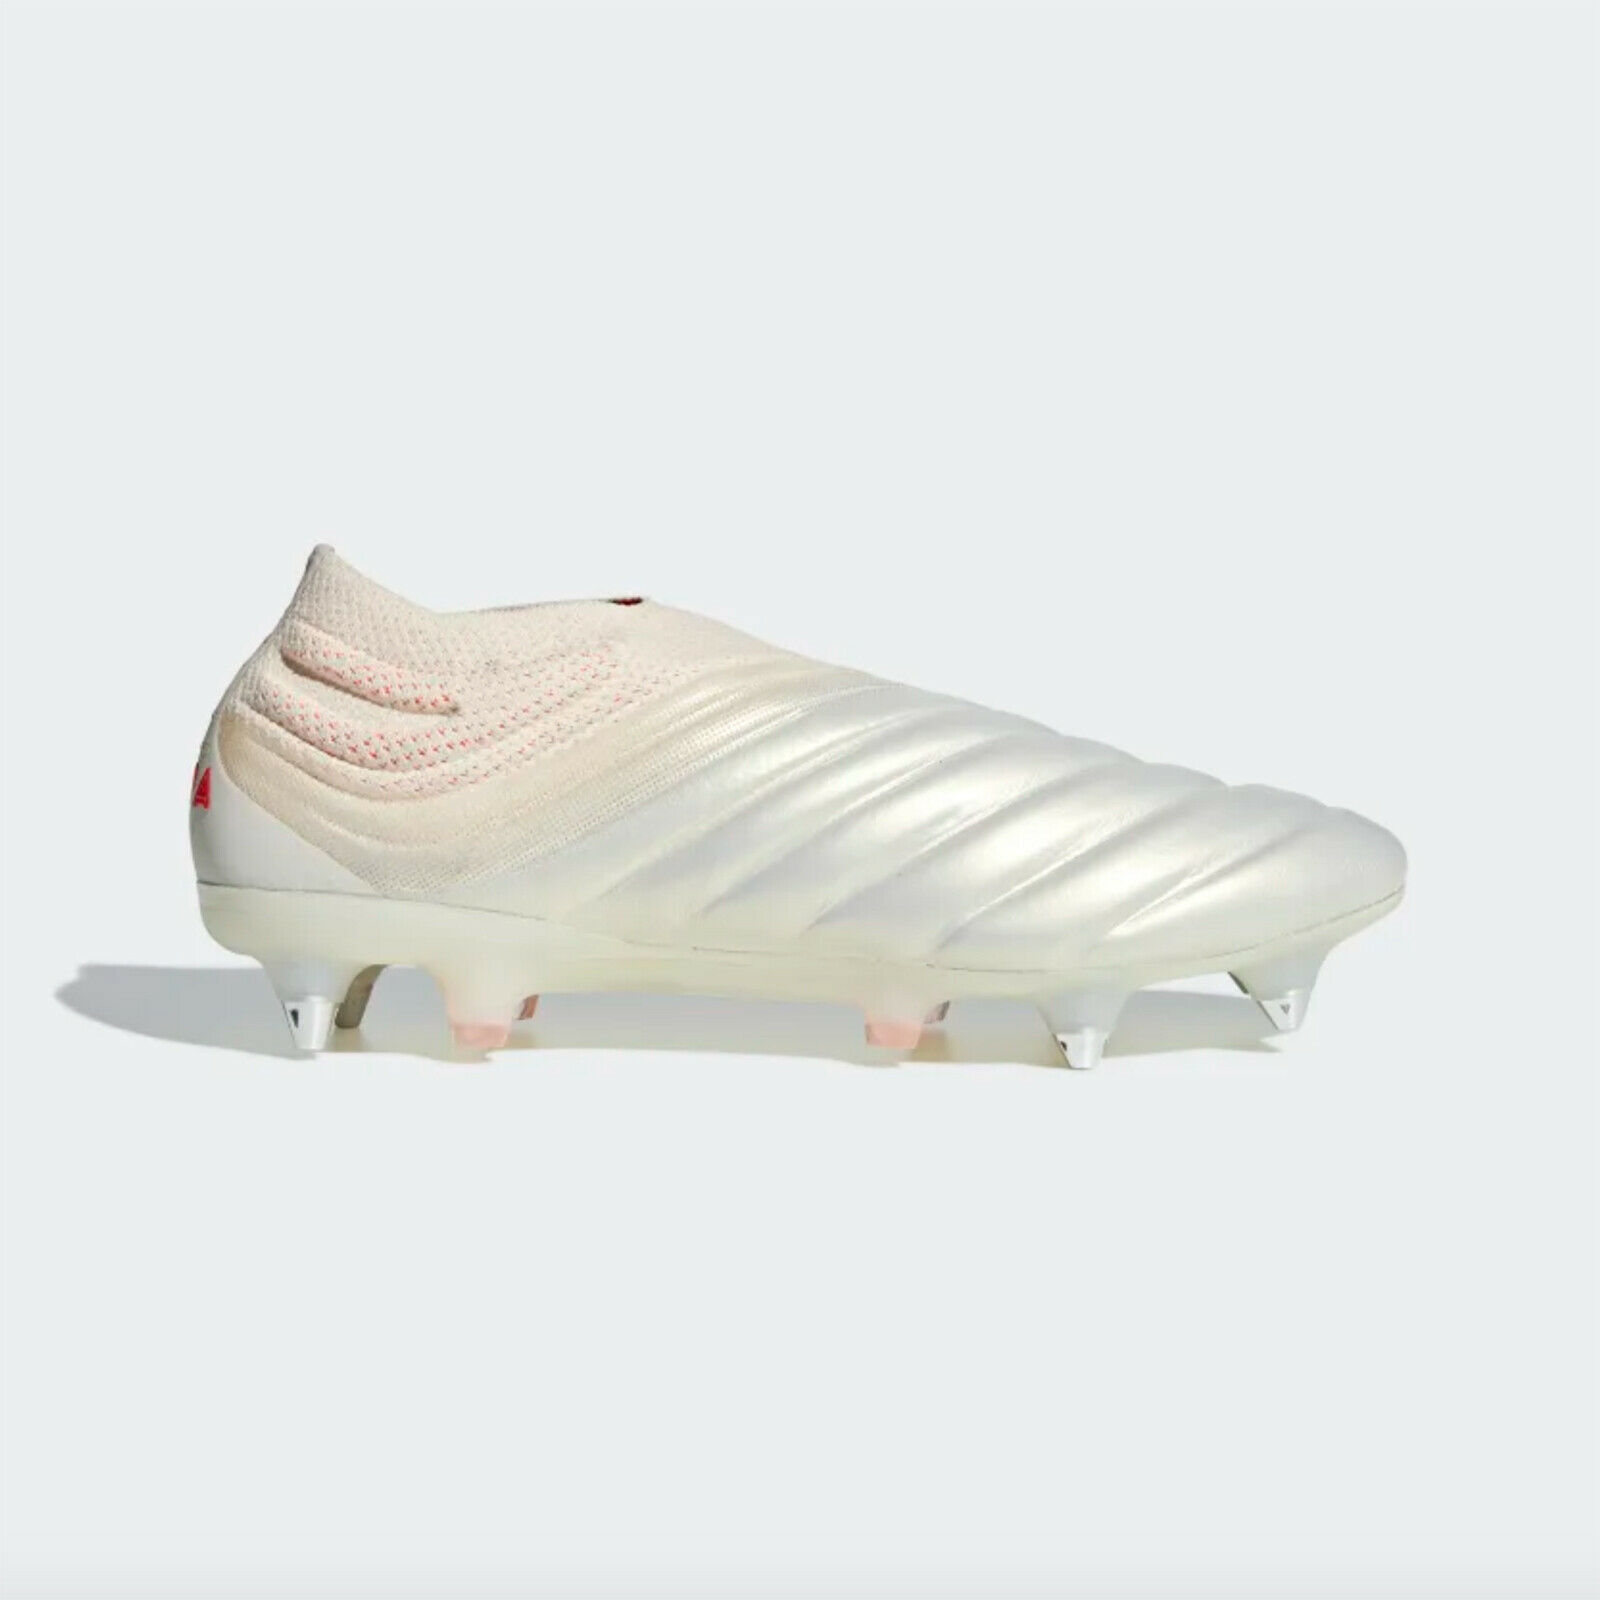 ADIDAS Copa 19+ Soft Ground Soccer Football Stiefel Us 9 Uk 8,5 Eur 42,5 F36073